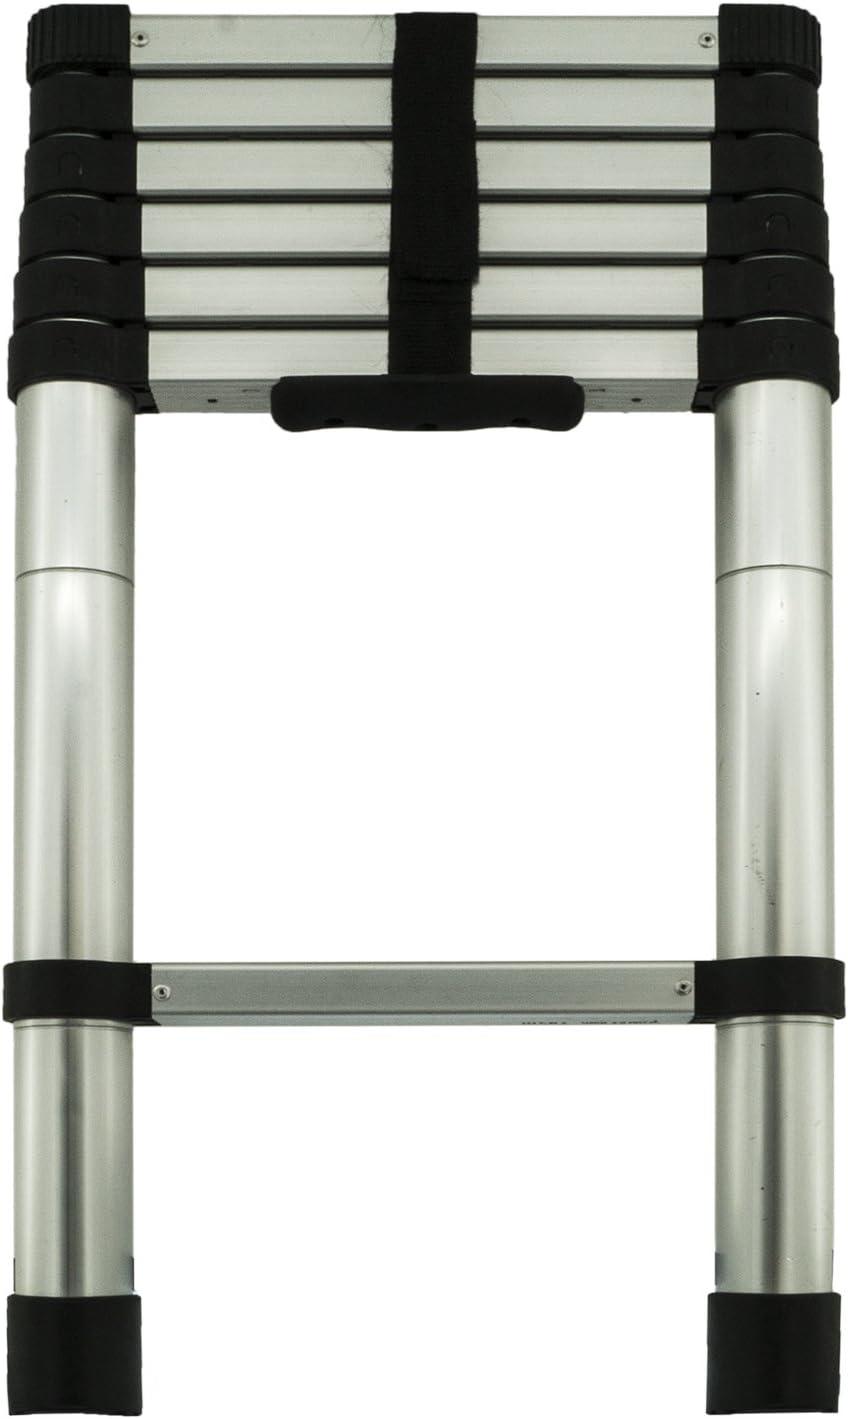 GoWesty Telescopic Ladder Designed for Volkswagen Vans